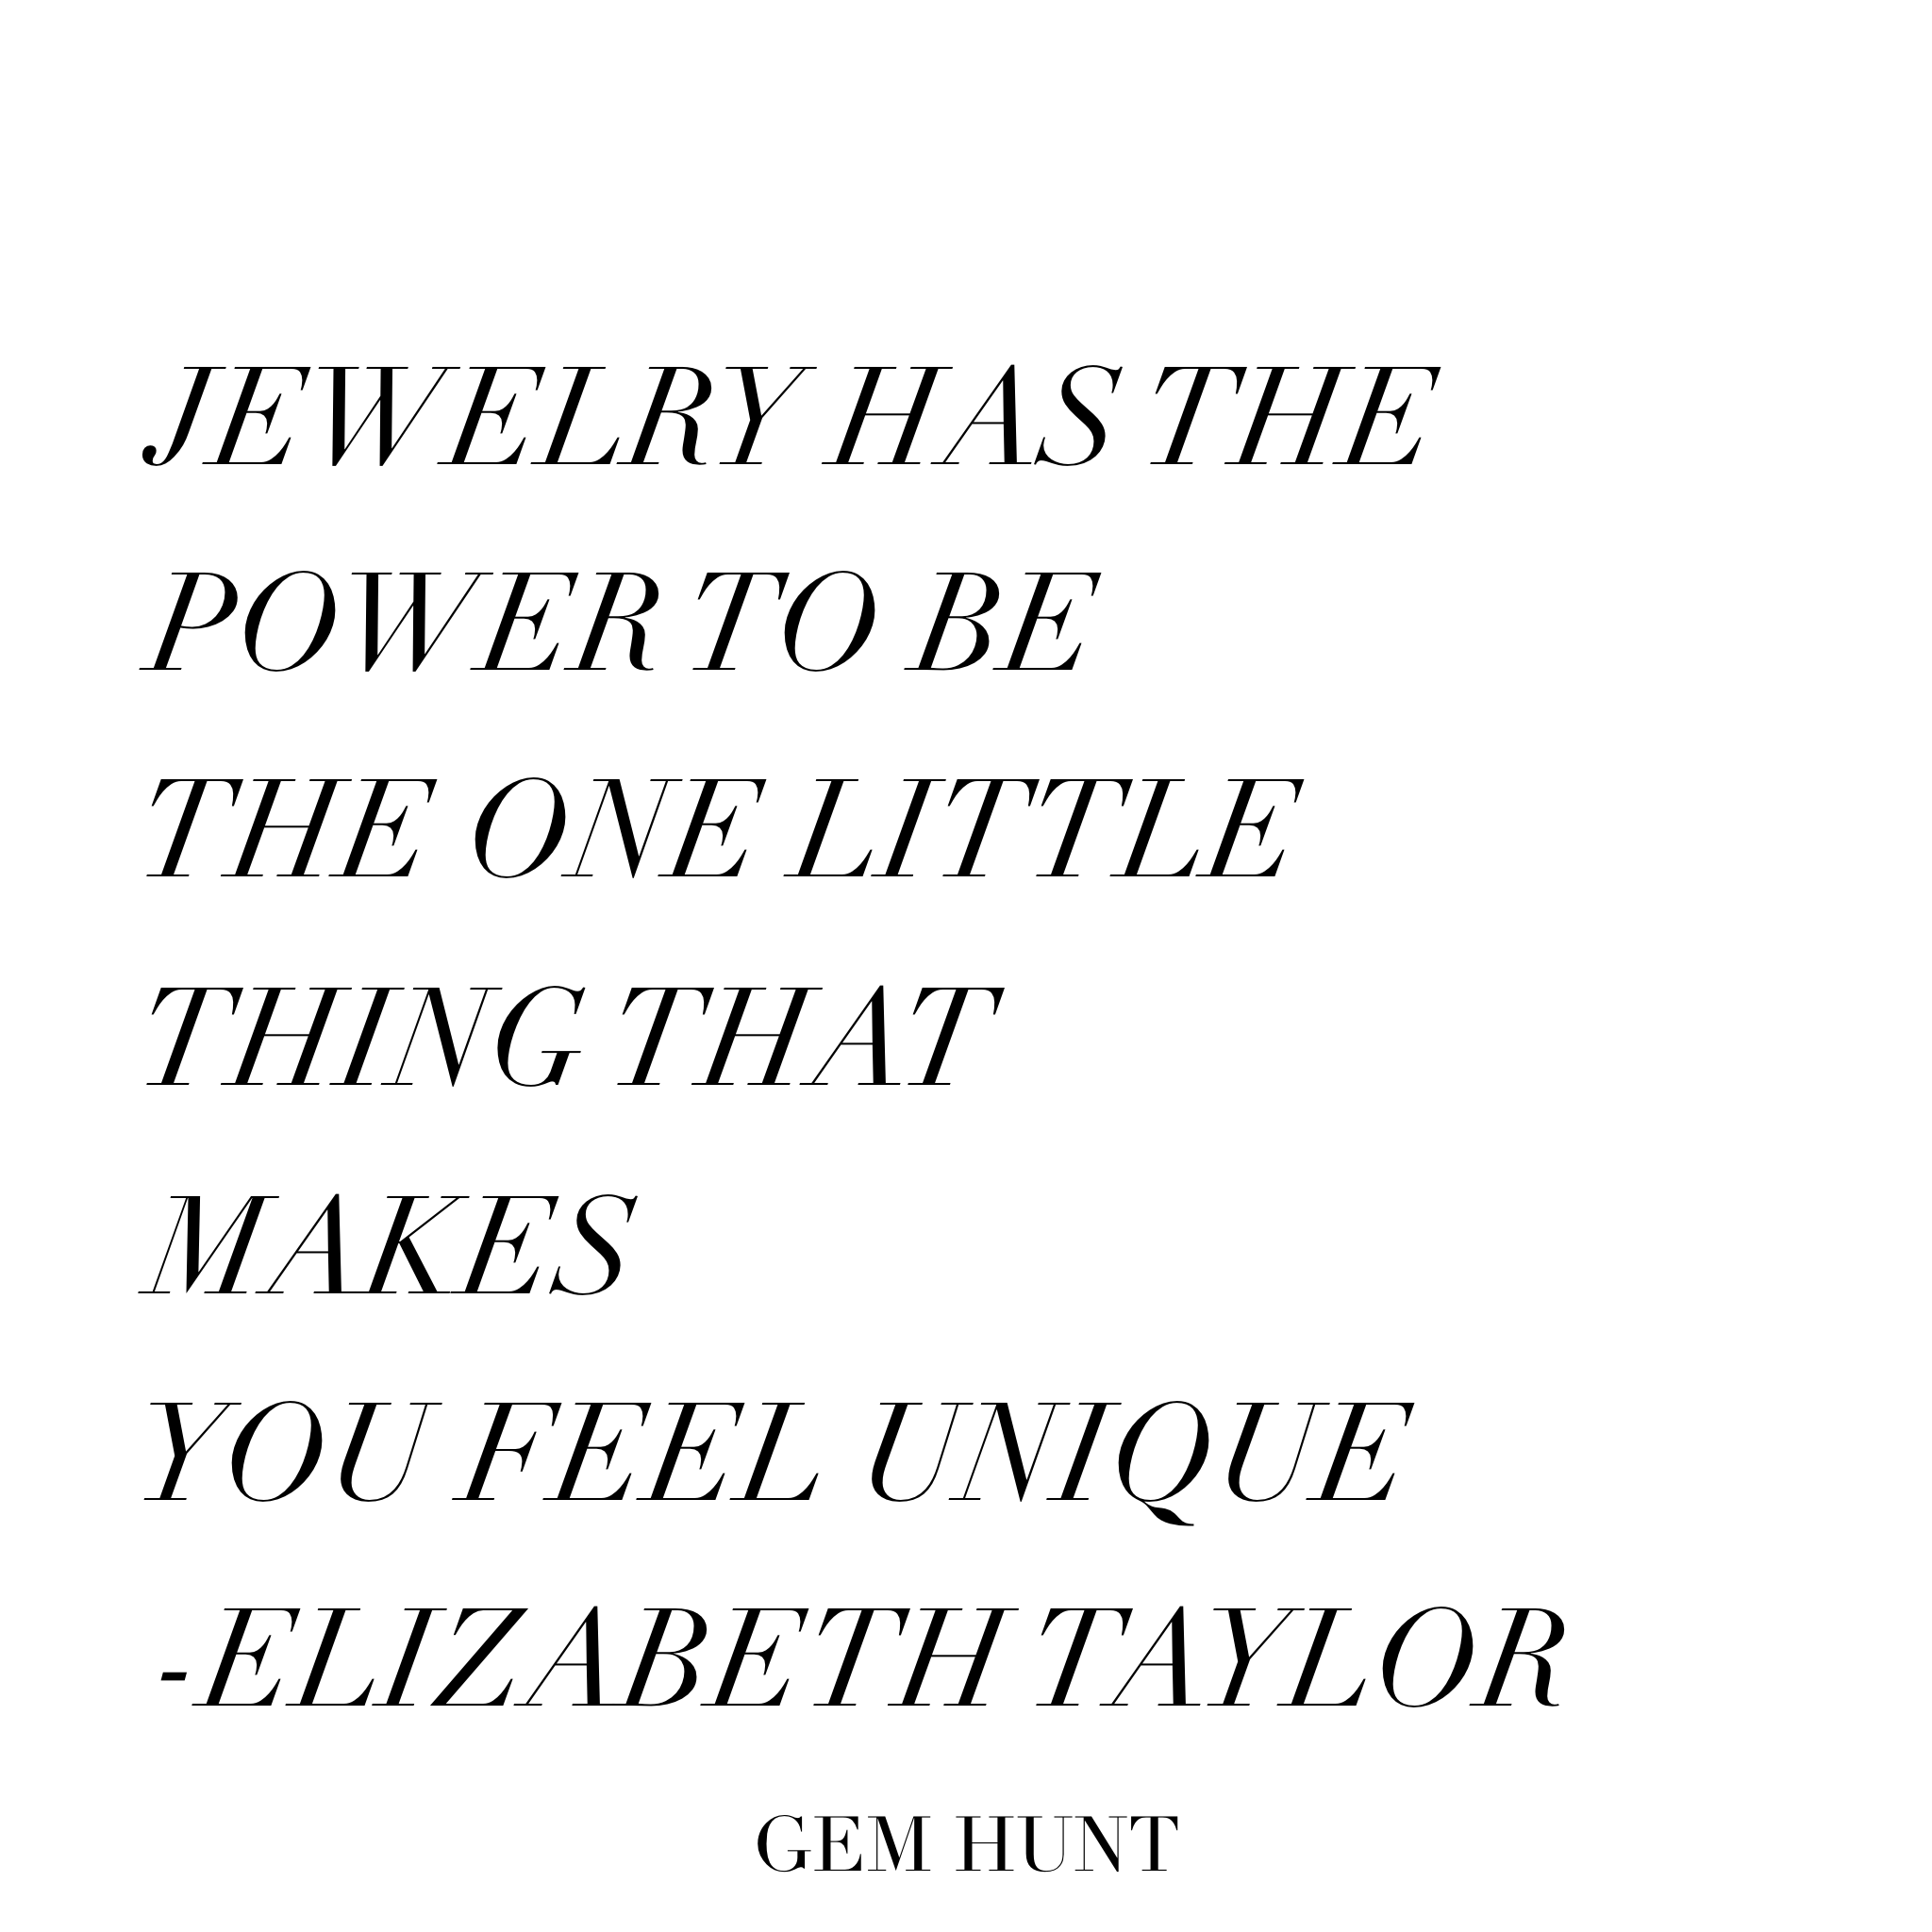 Elizabeth Taylor Jewelry Quote